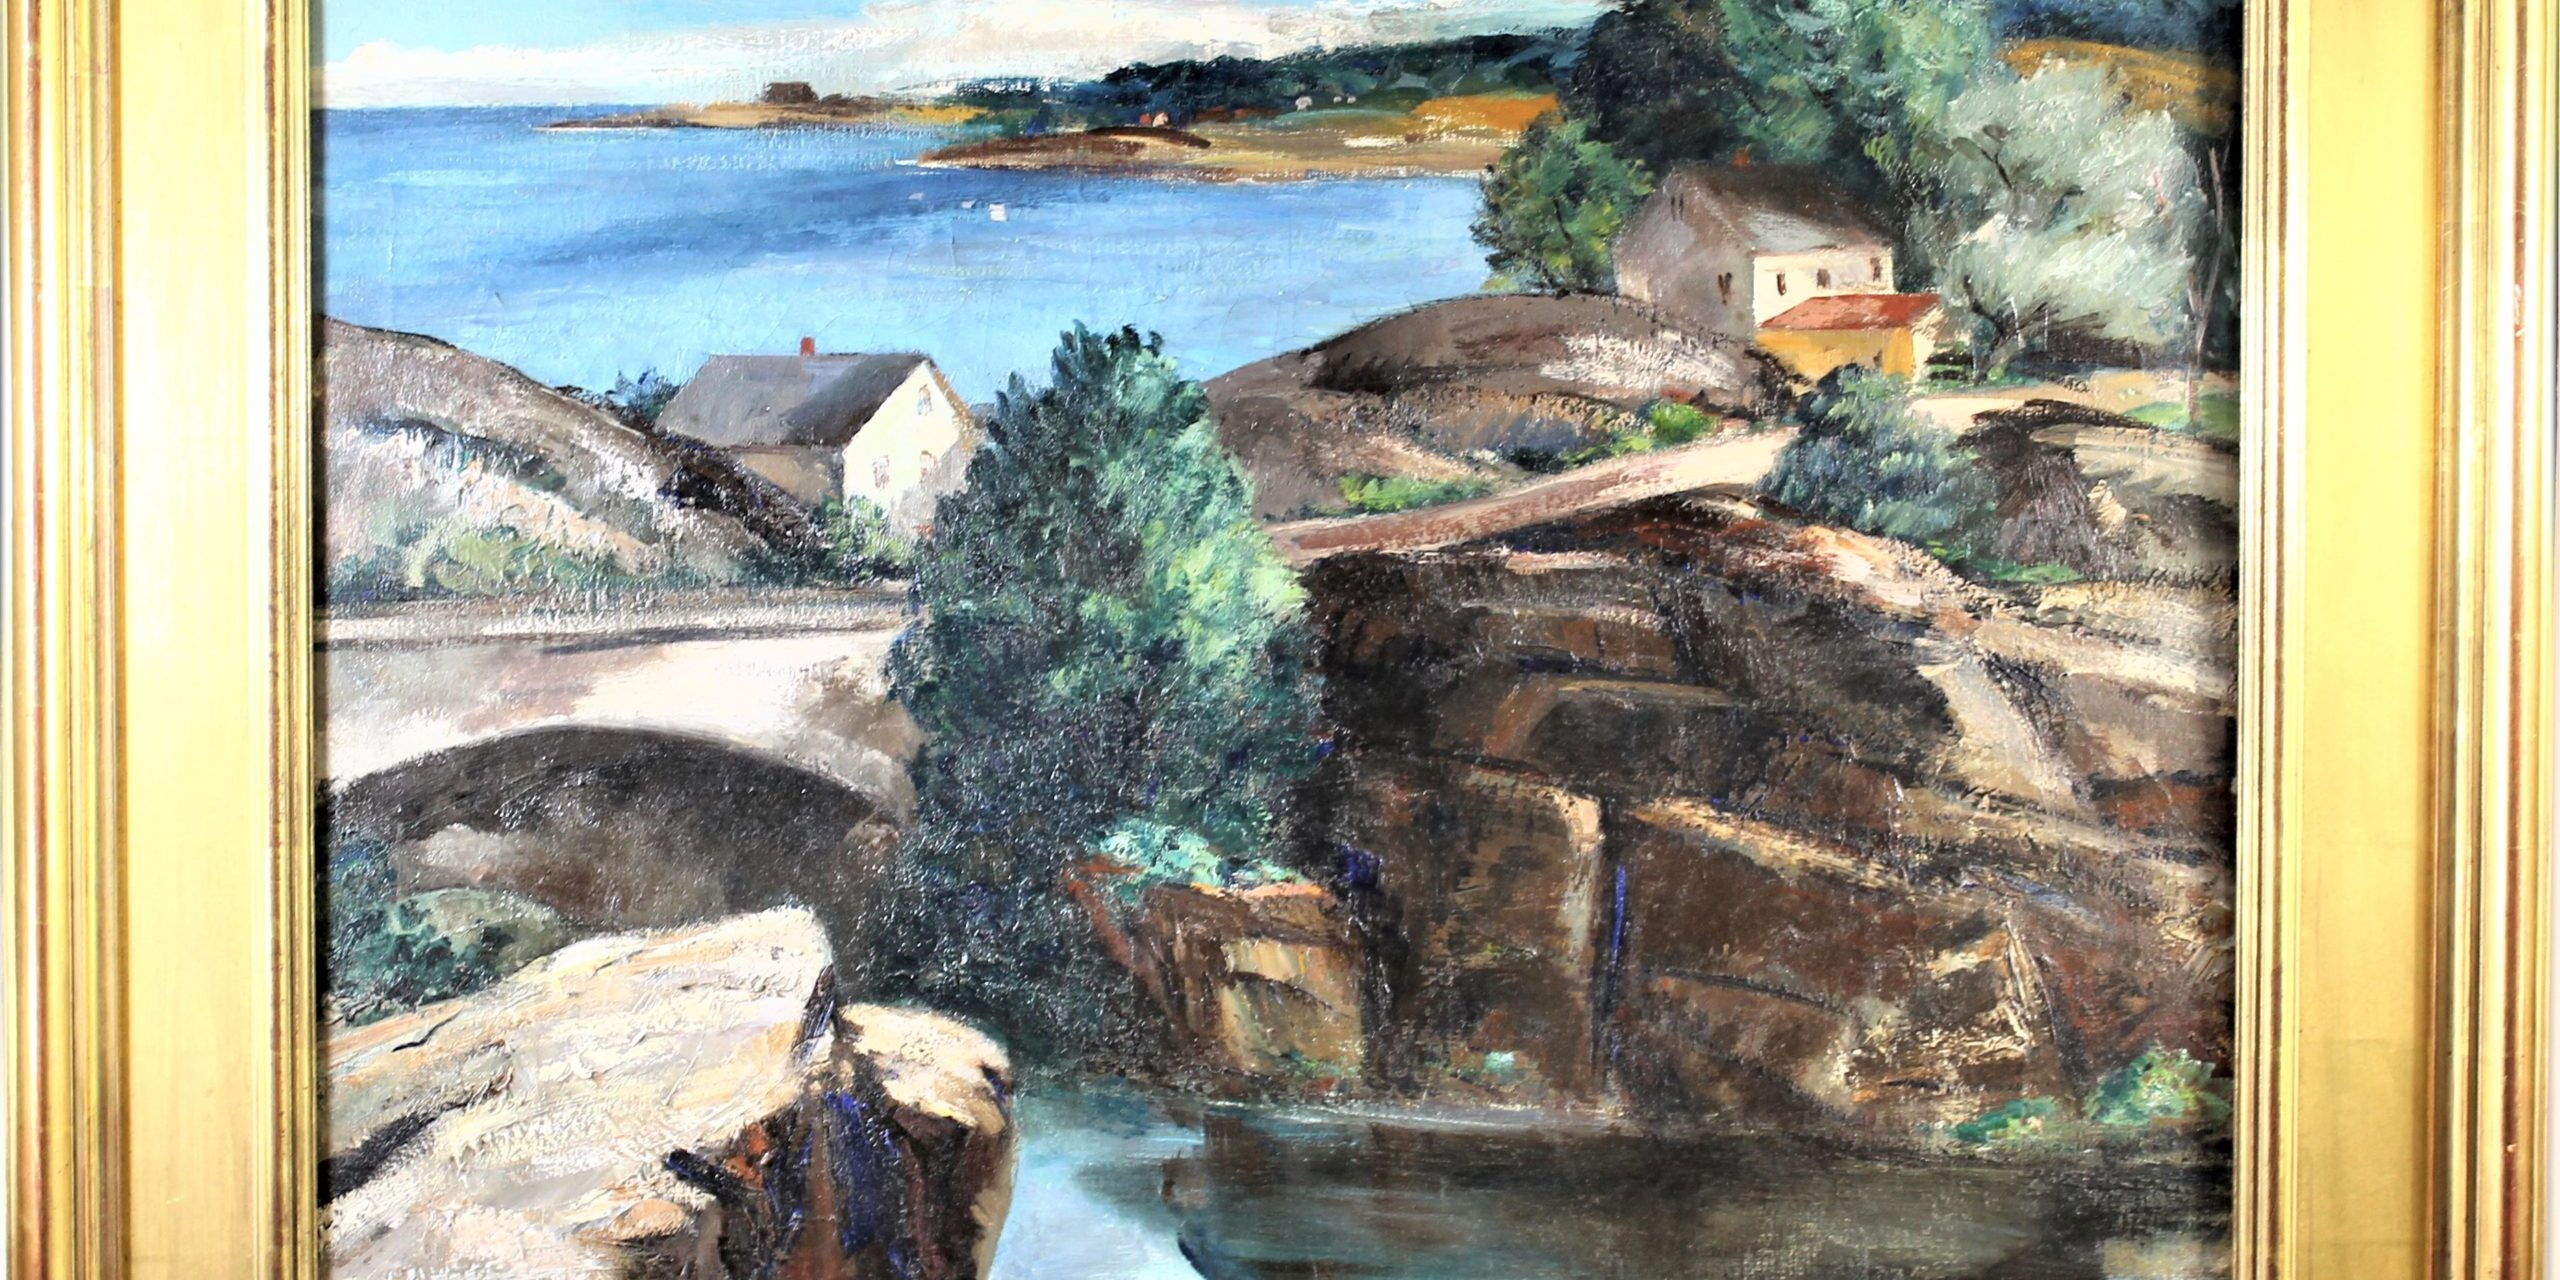 Ann-Brockman-1899-1943-Maine-Landscape-Oil-on-Canvas-scaled